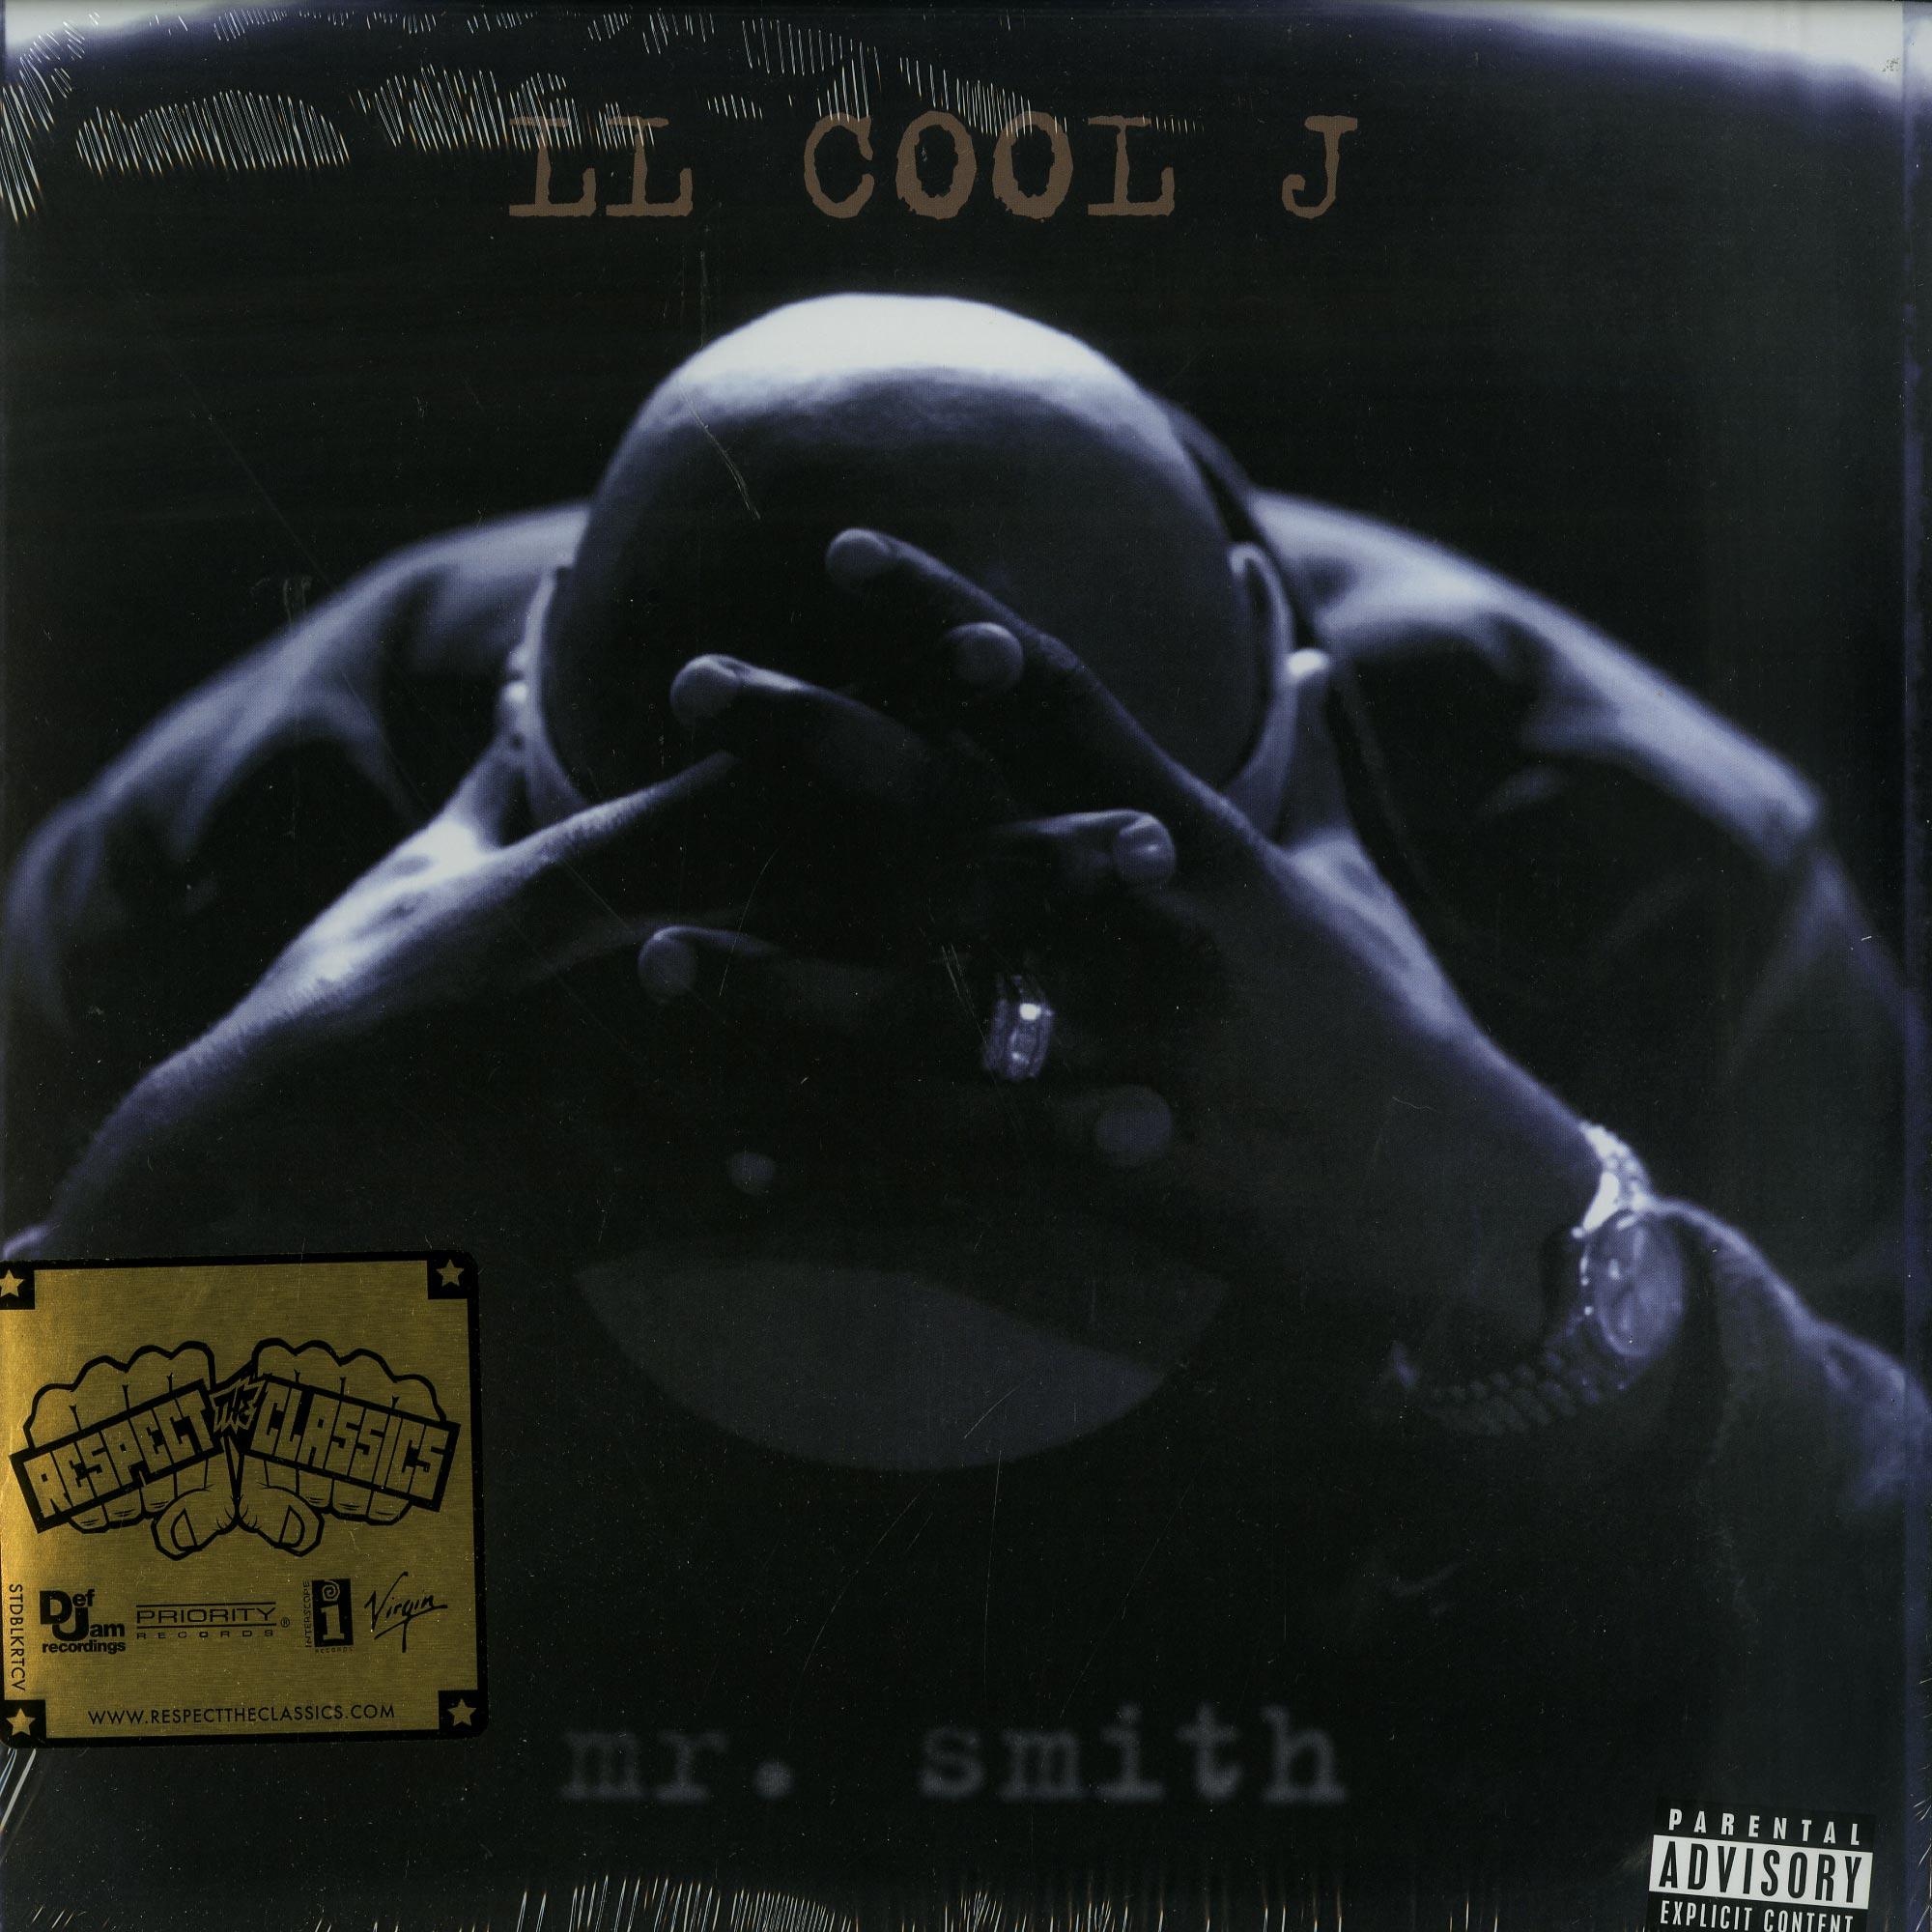 LL Cool J - MR. SMITH